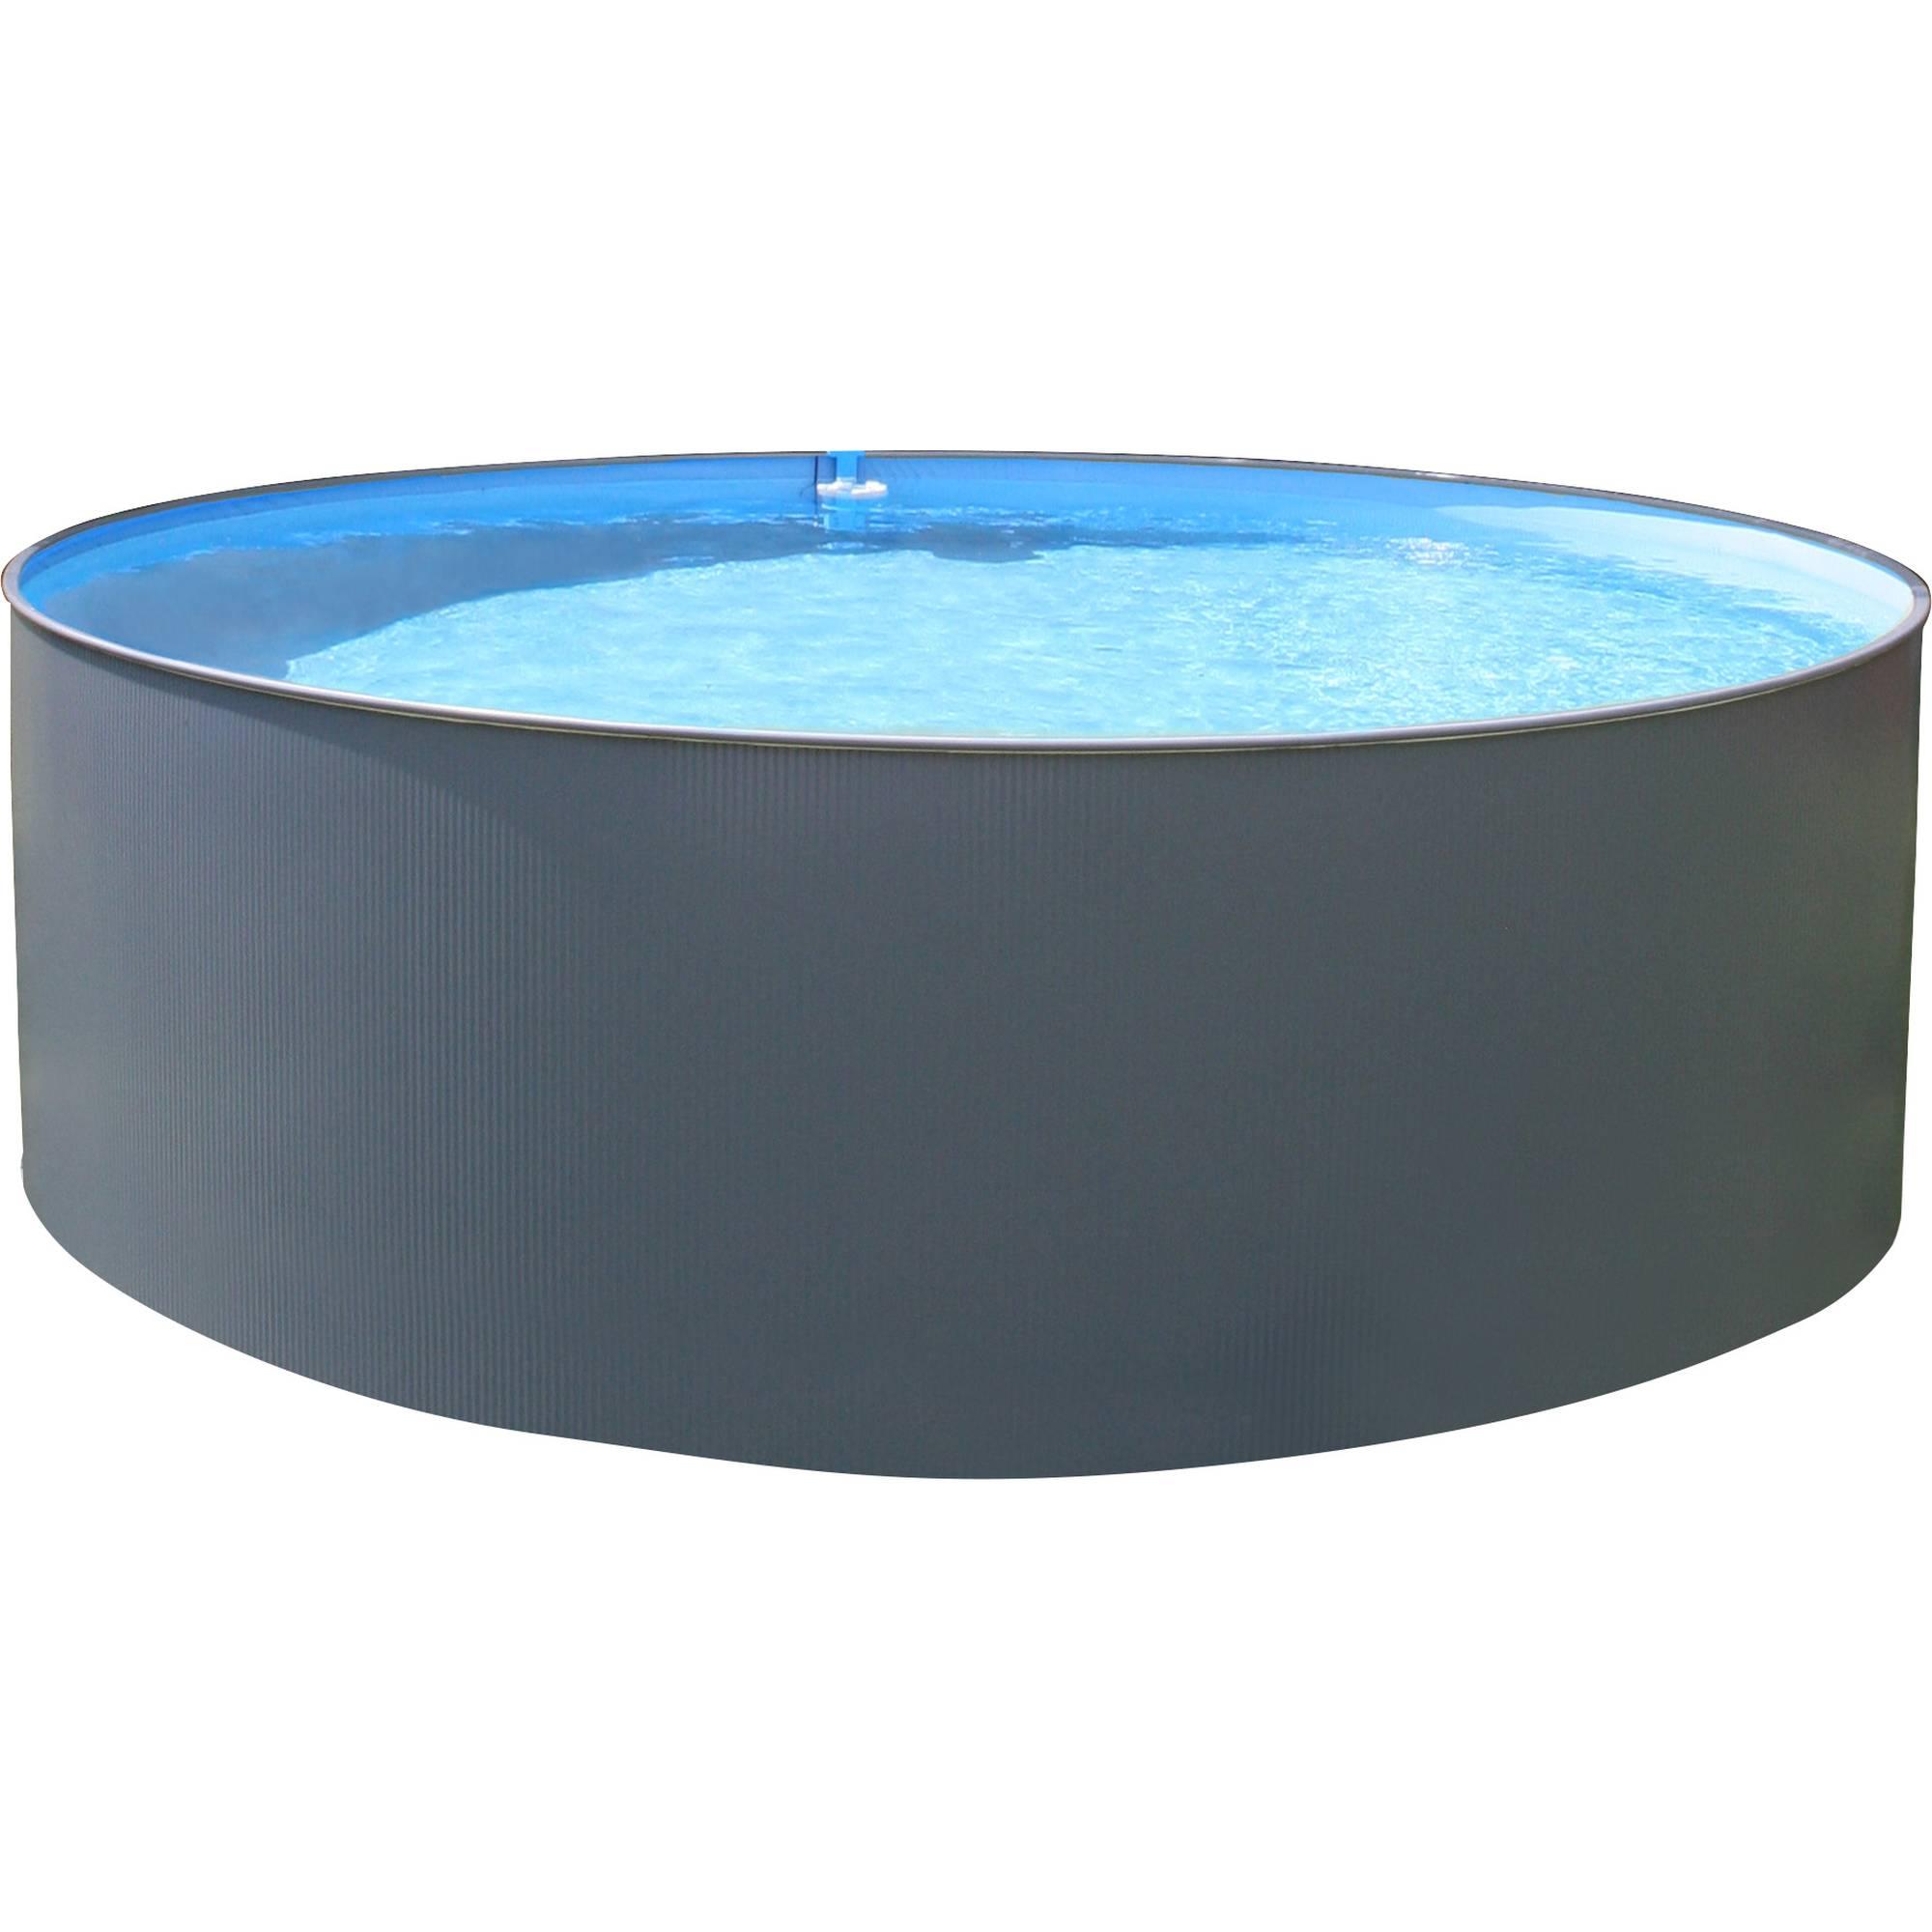 Stahlwandpool rundform anthrazit 450x90 cm, overlap S0